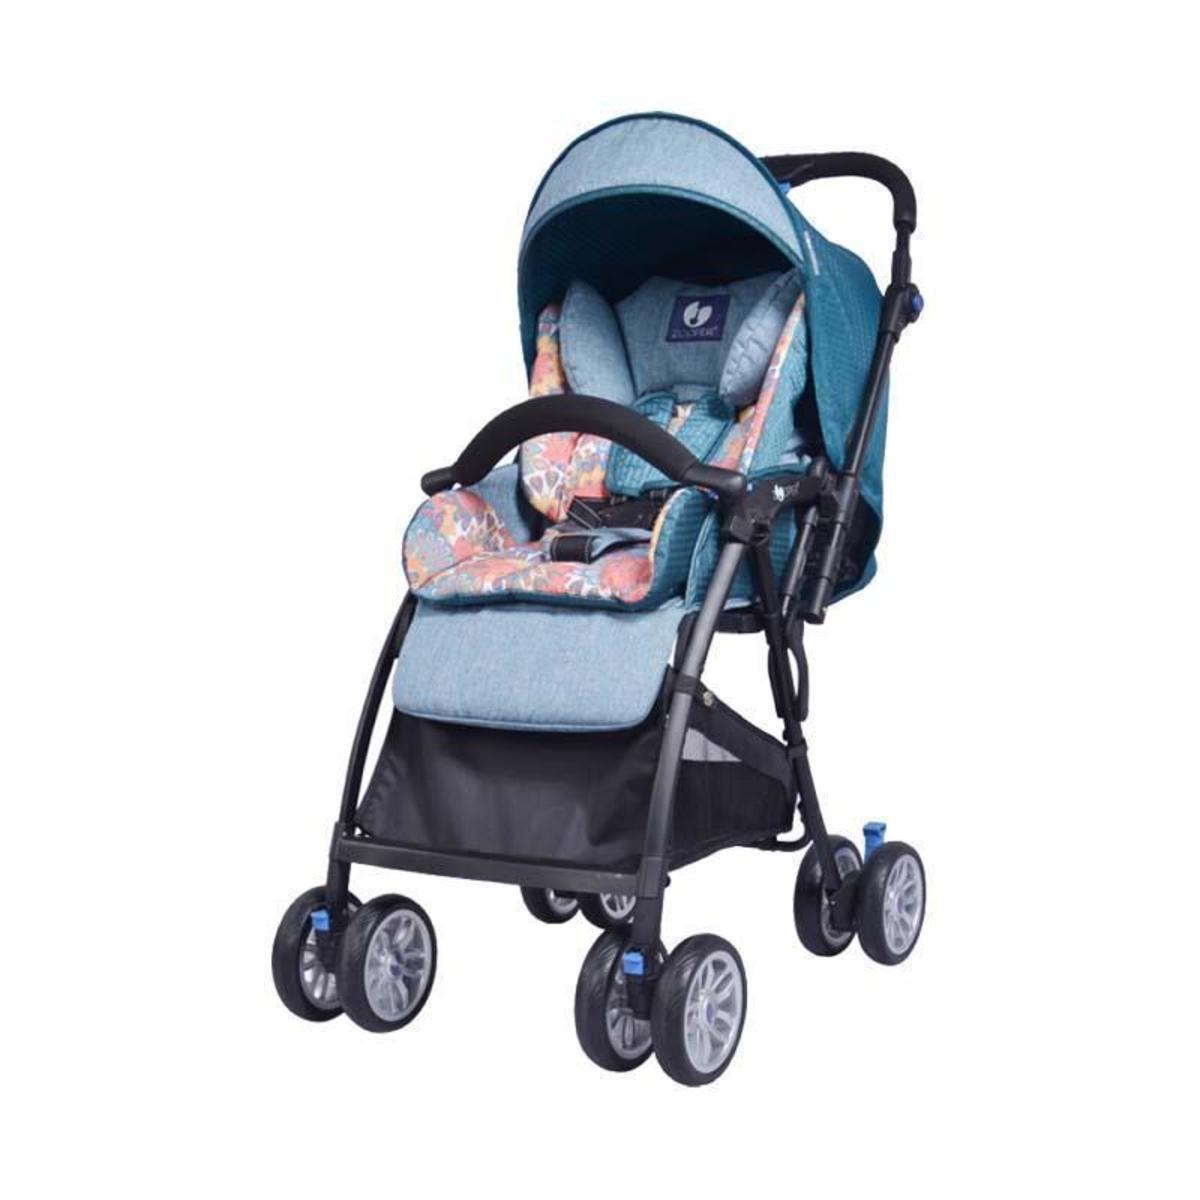 Zooper® Salsa2 All Weather Folding Stroller 0-36 Months American Brand - Sea blue